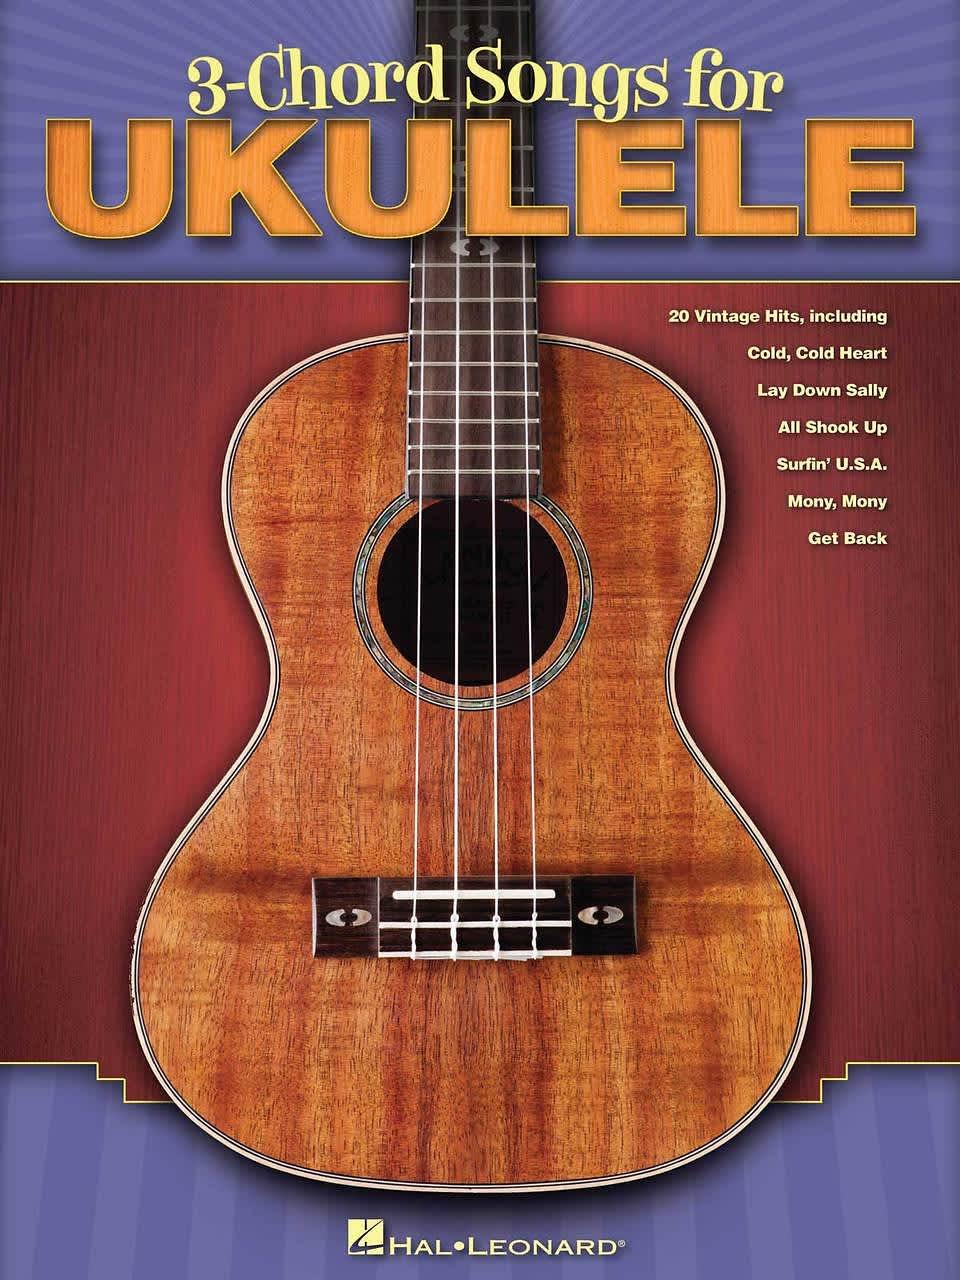 3 Chord Songs For Ukulele My Music Life Reverb